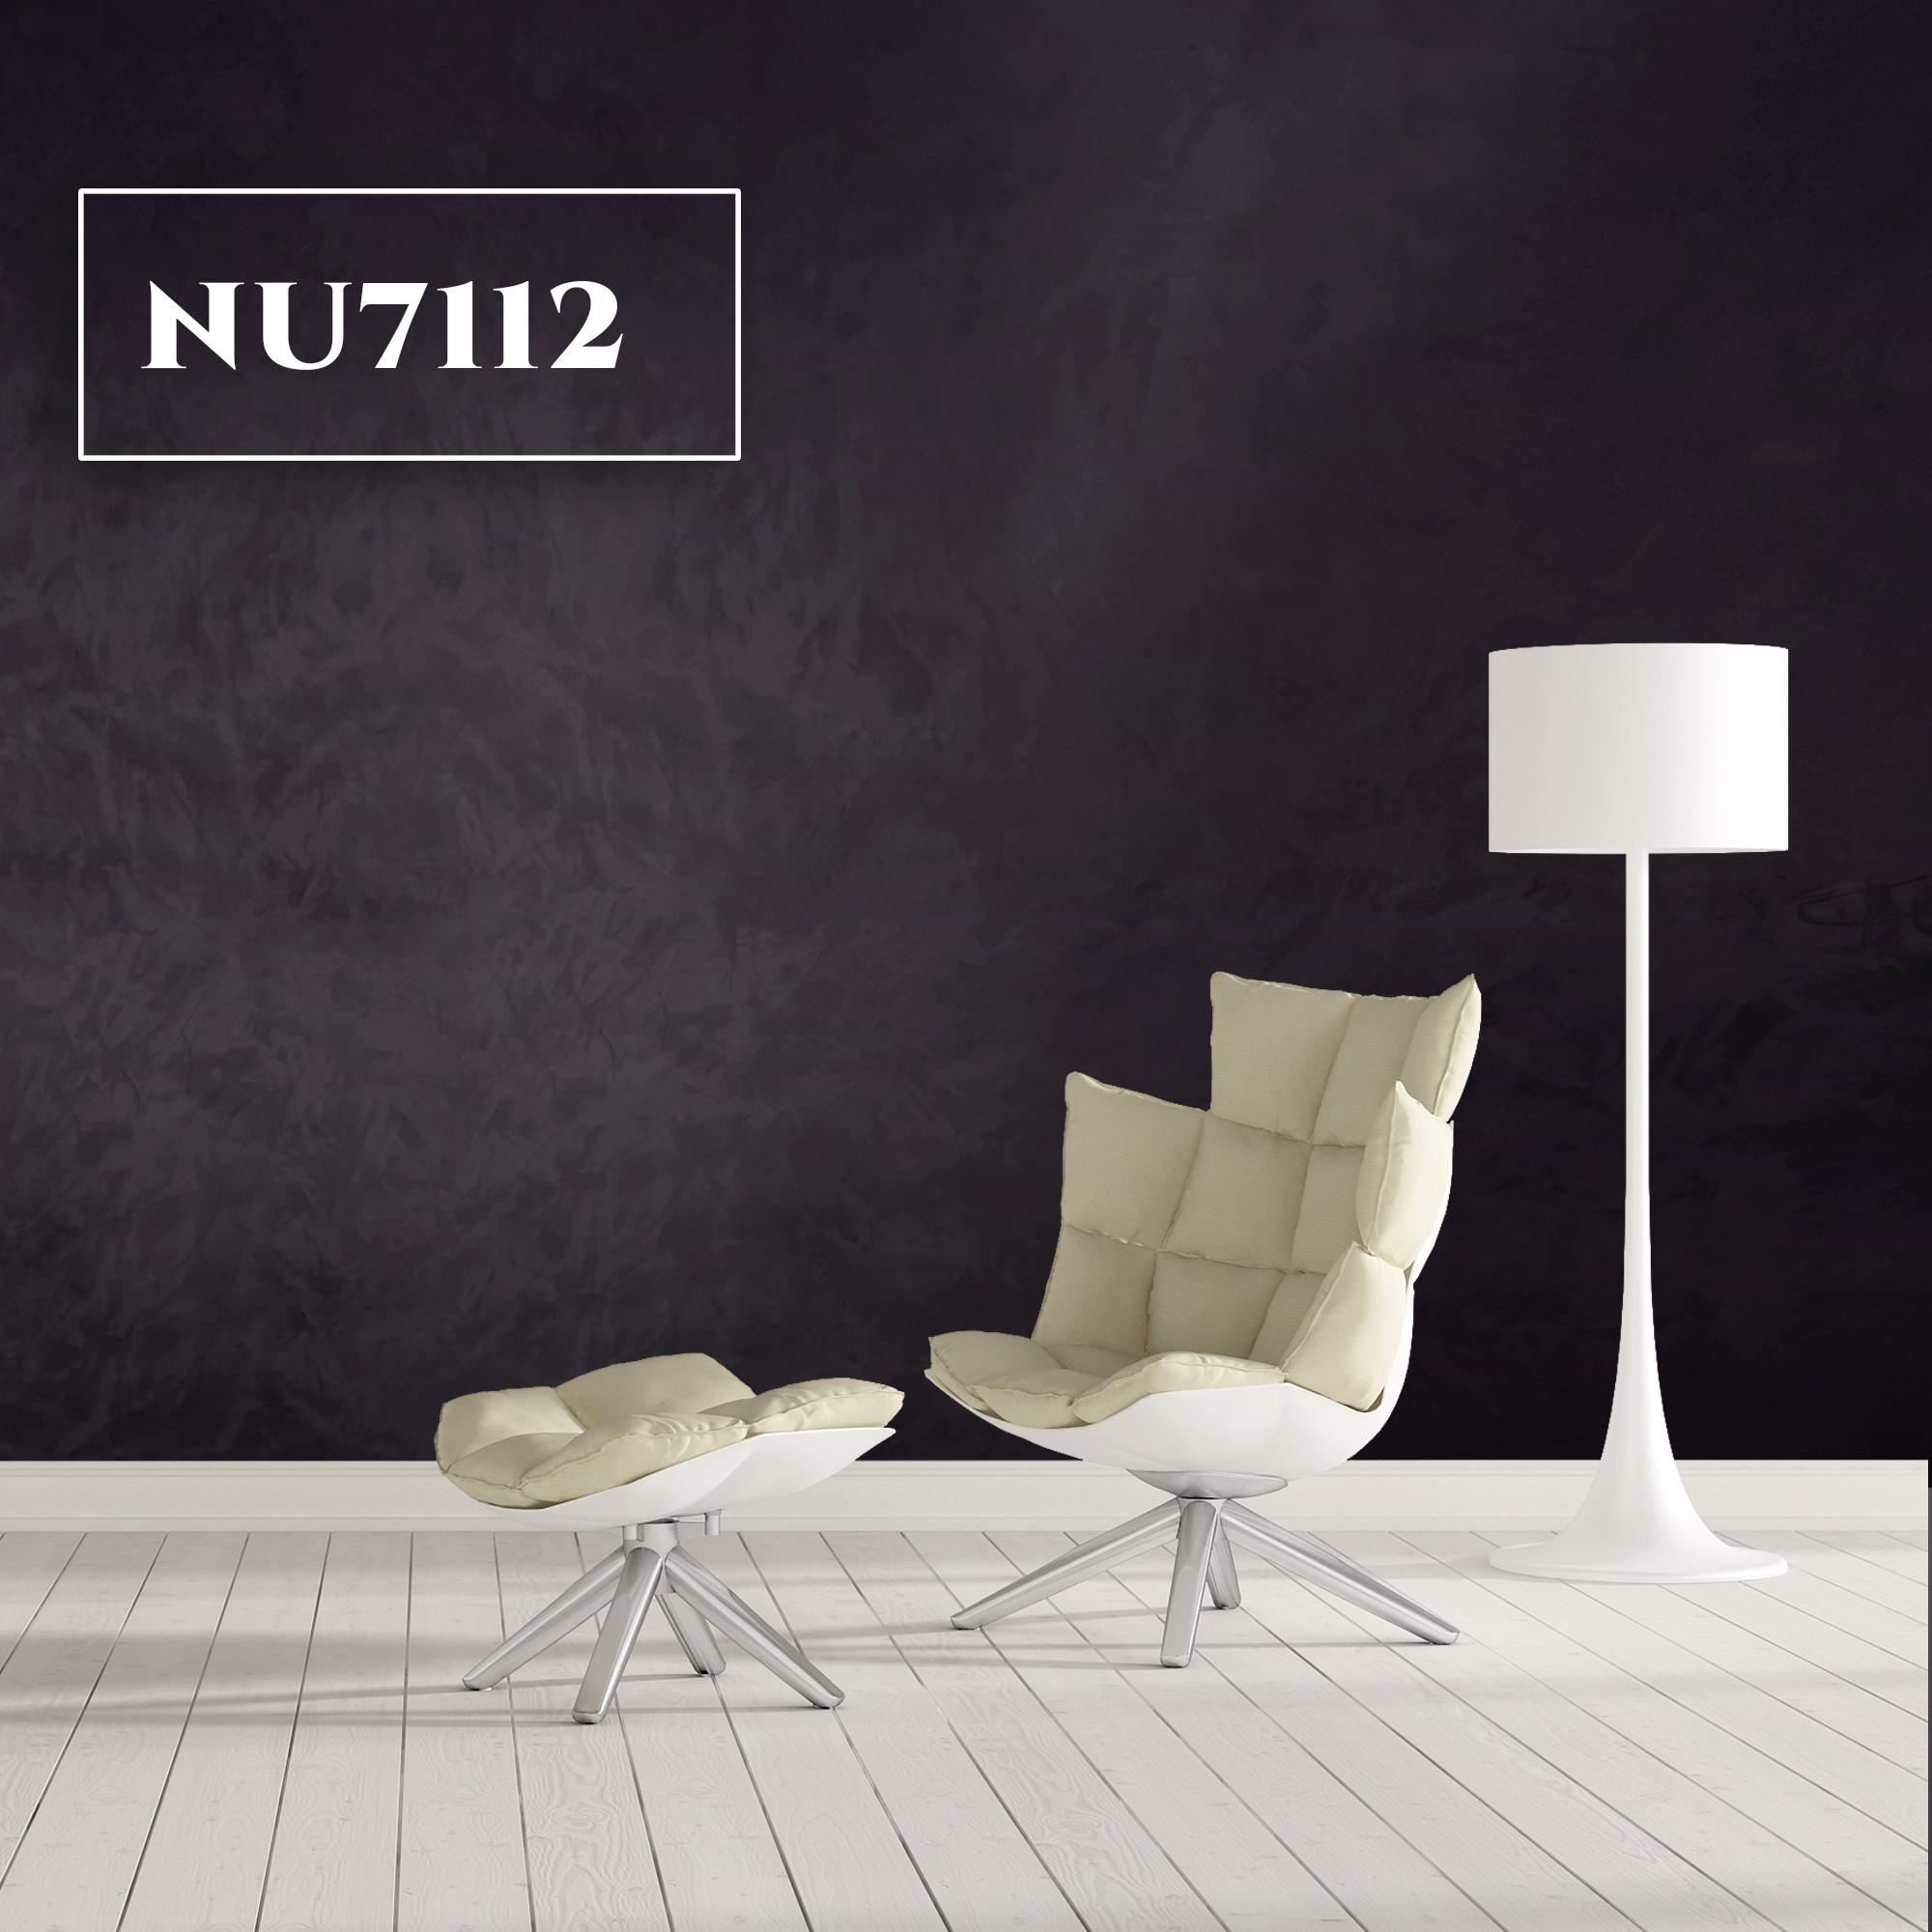 NU7112